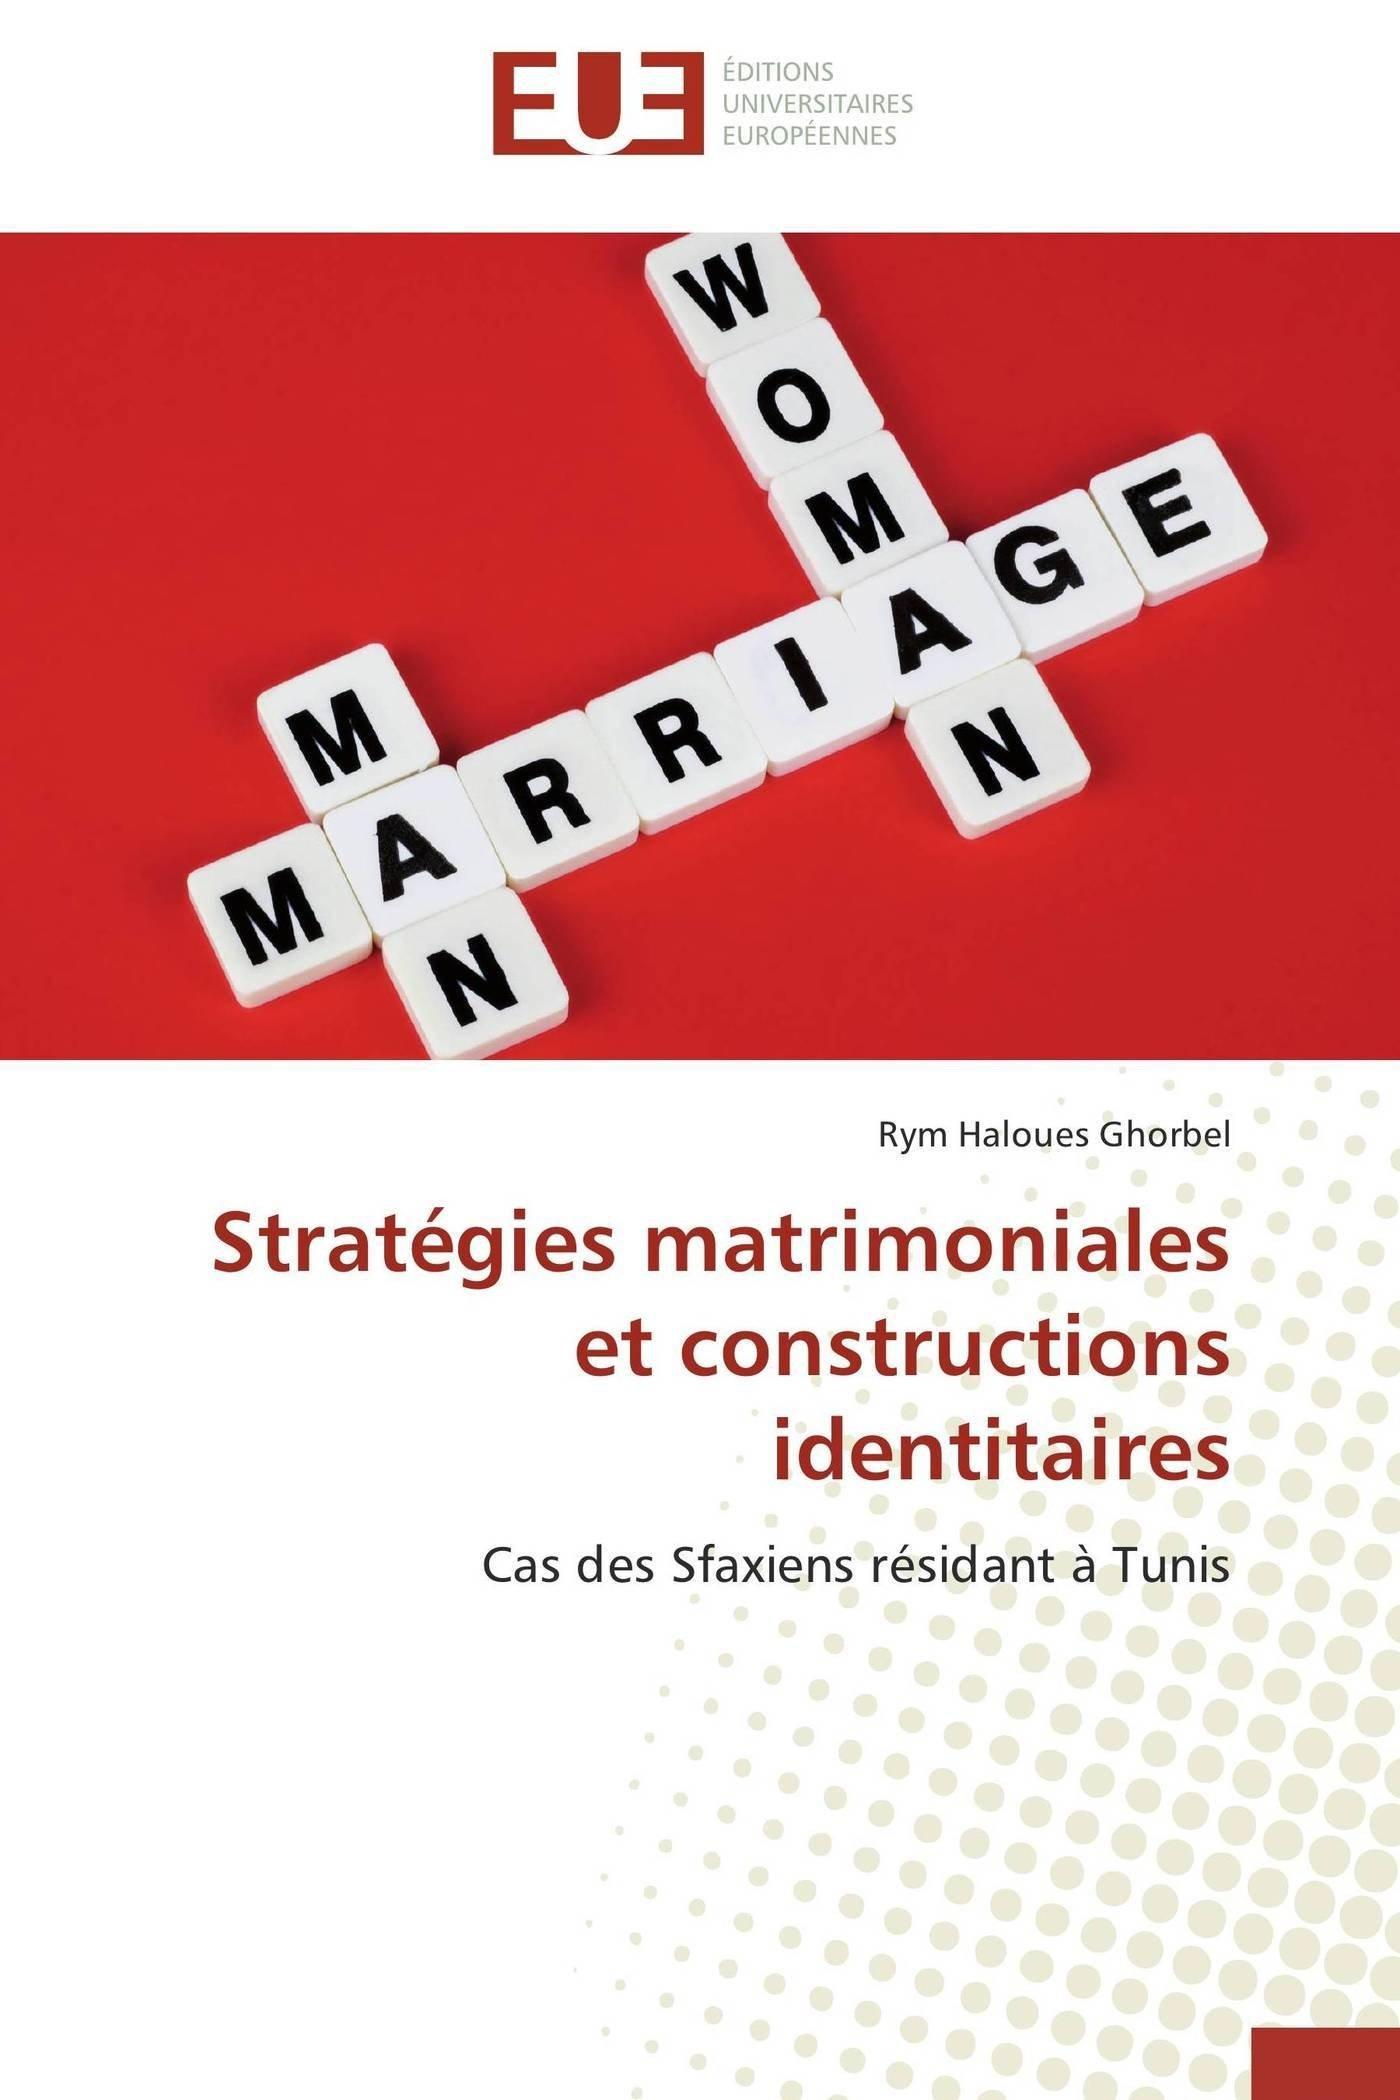 site de matrimoniale gratuit tunis